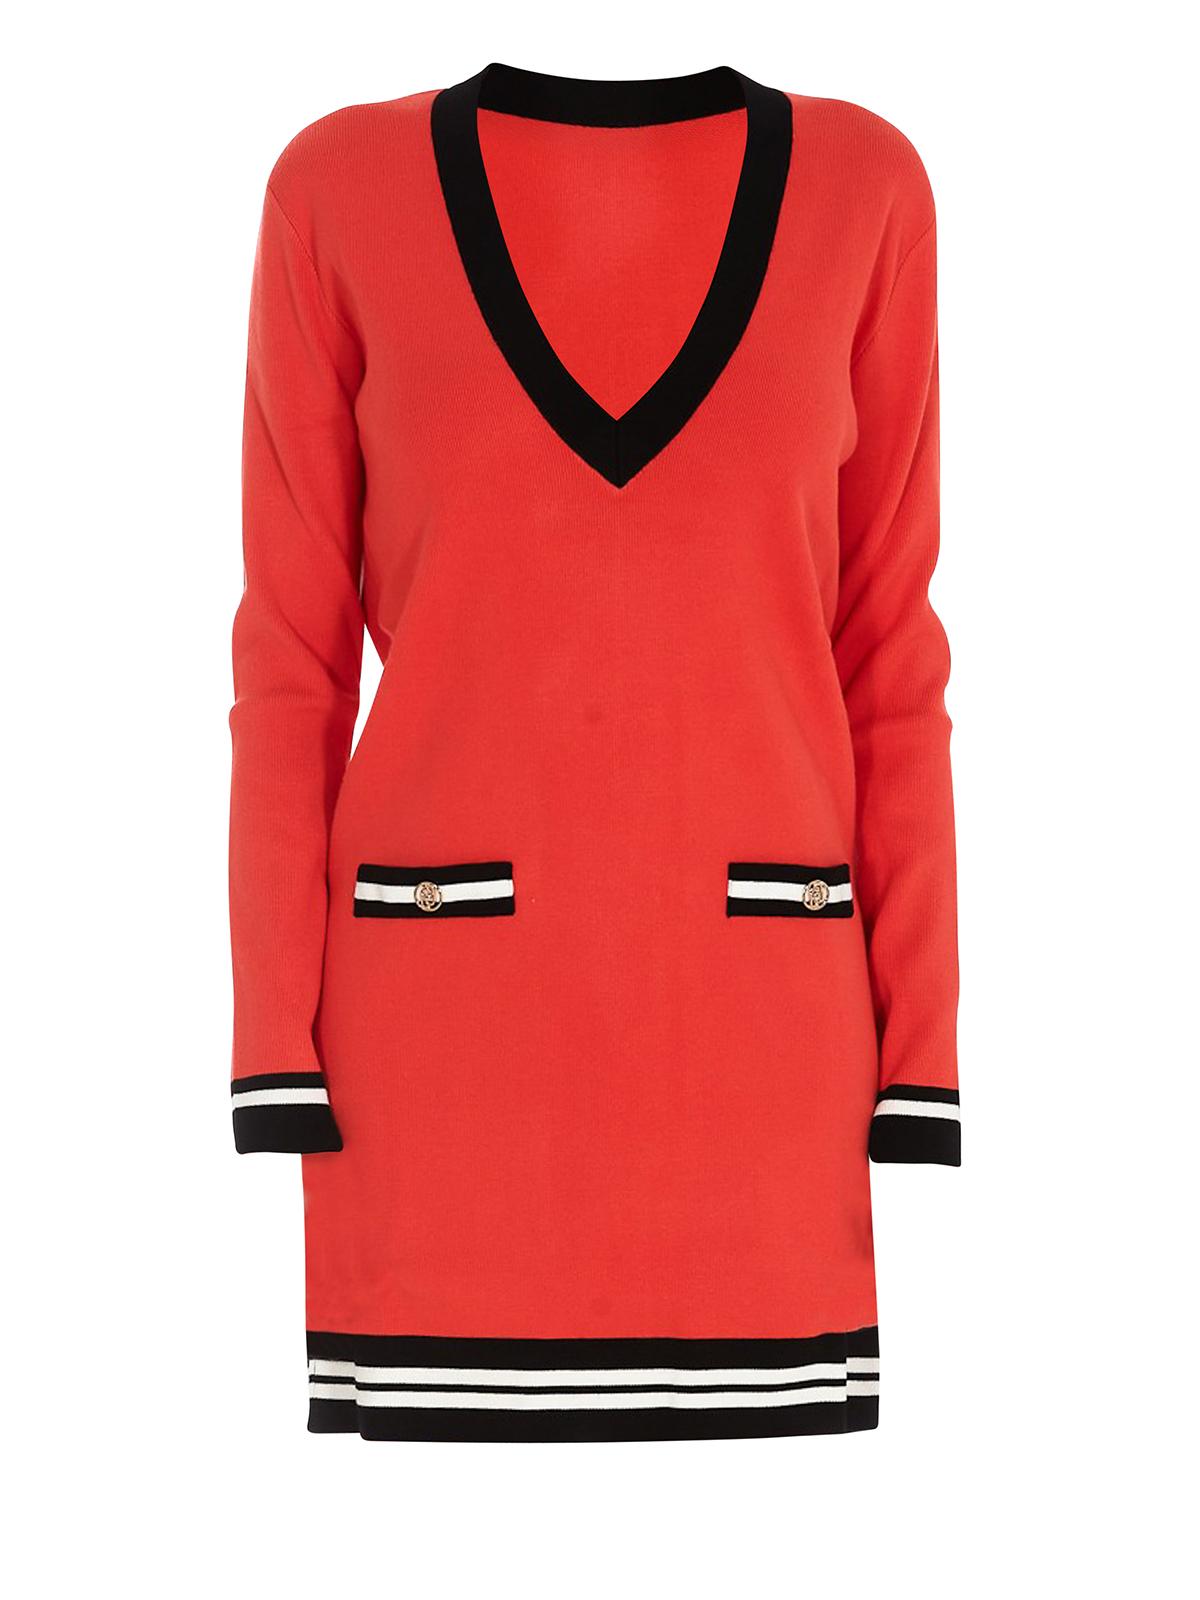 Liu •jo RED V-NECKLINE DRESS